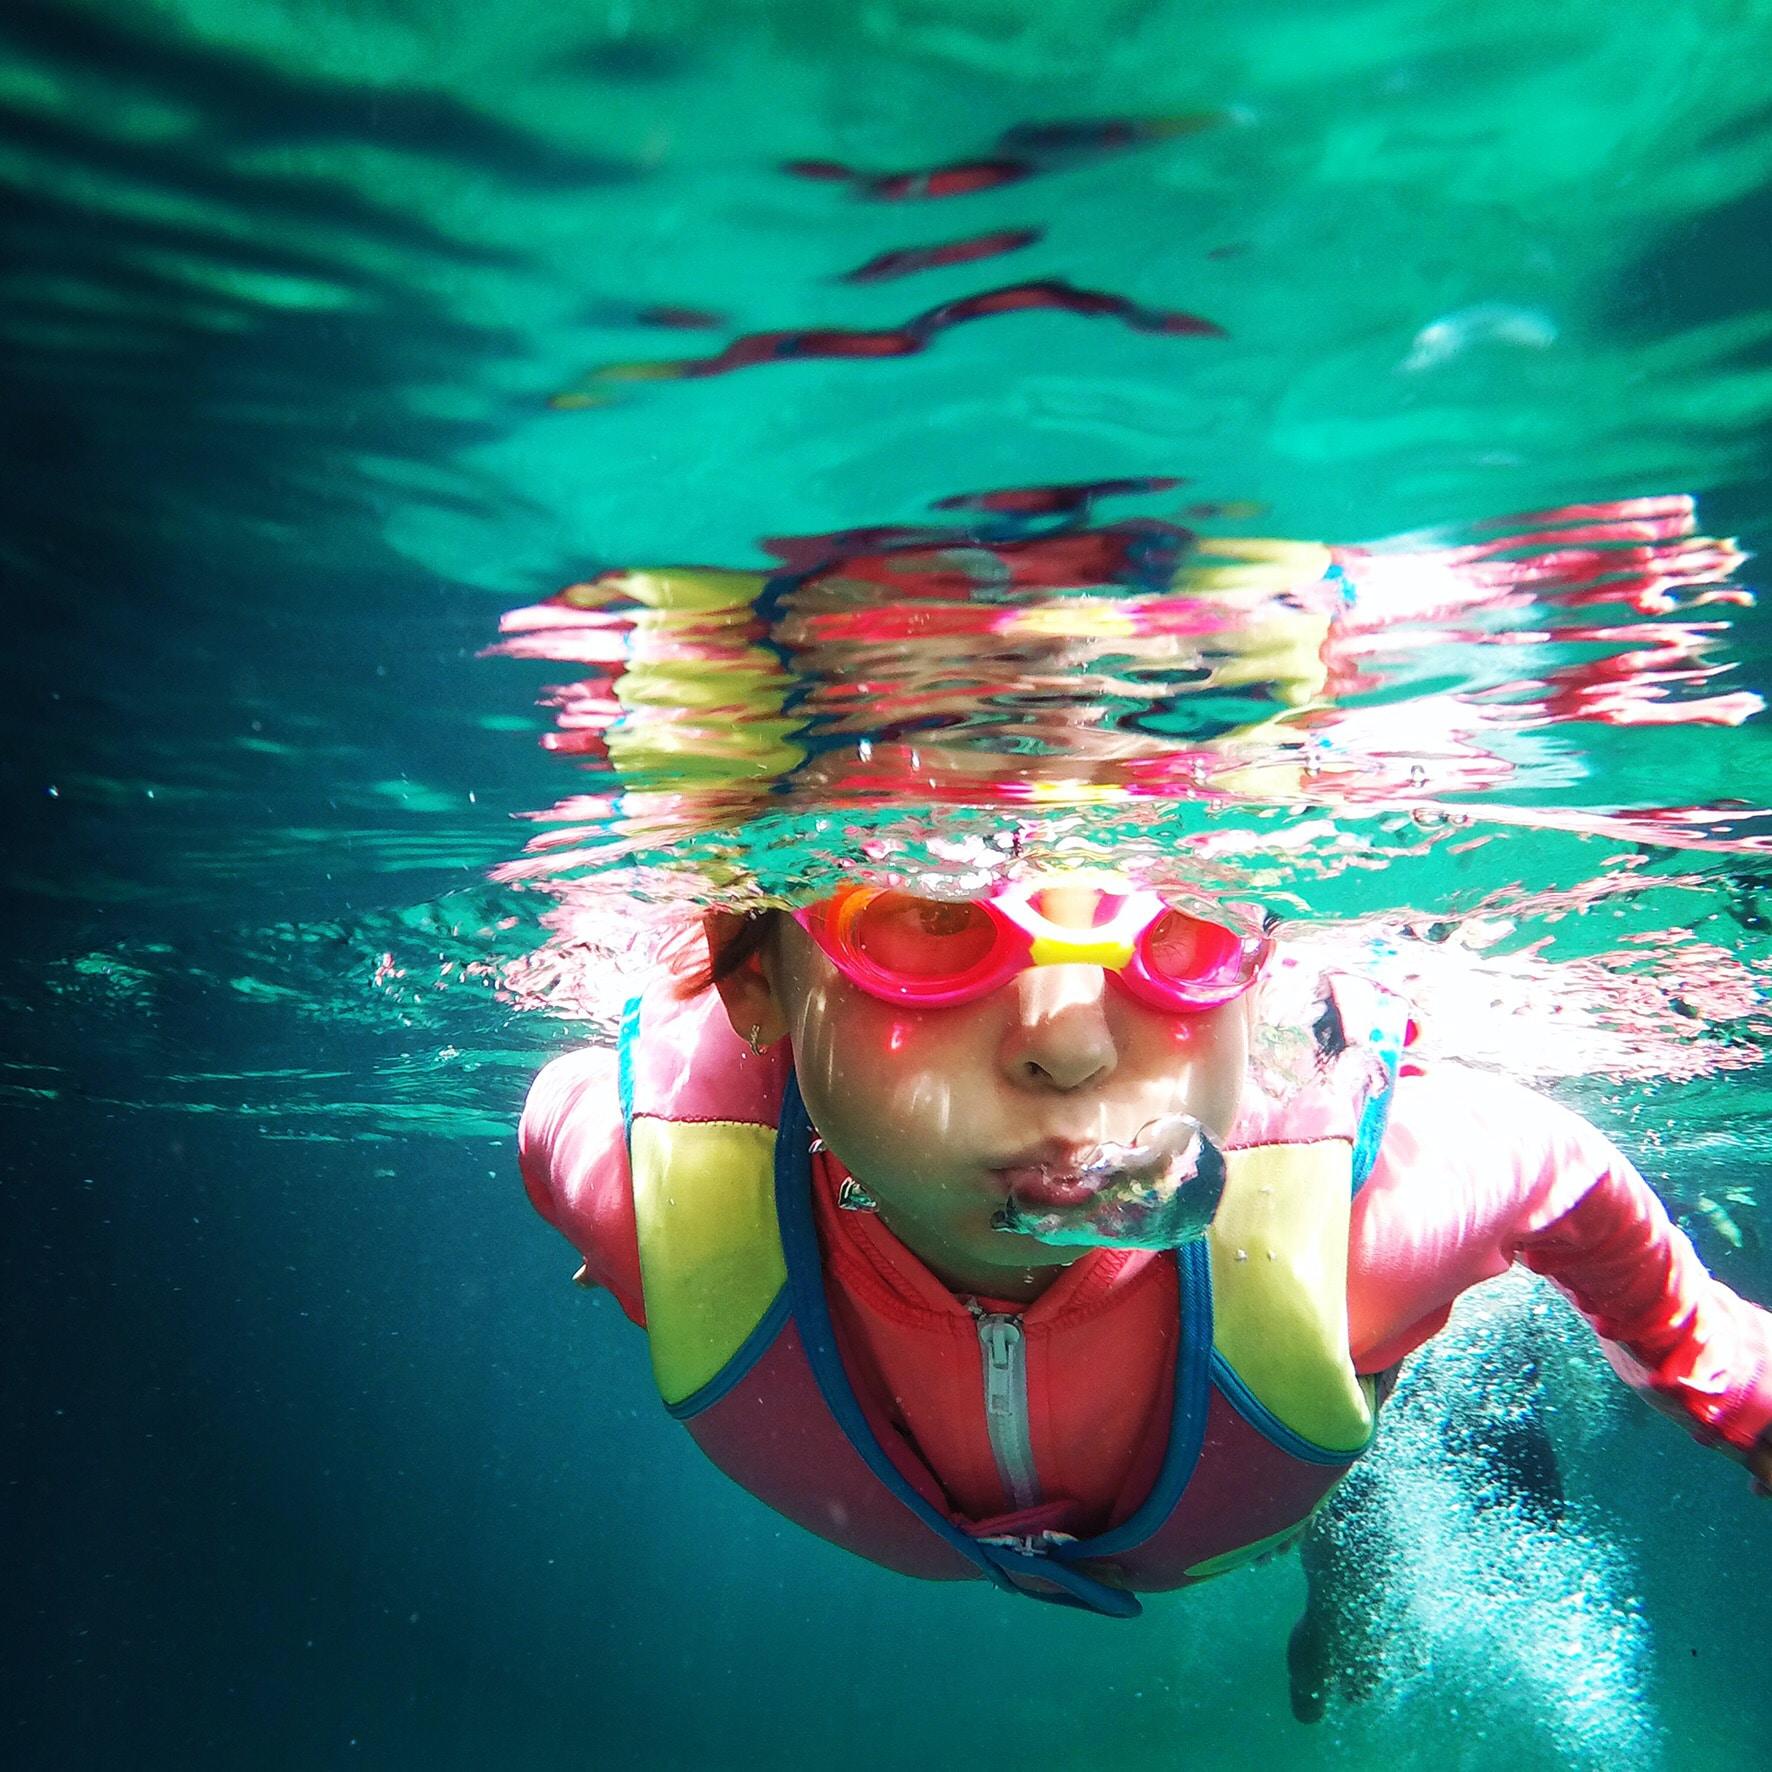 practica-natacion-de-forma-segura